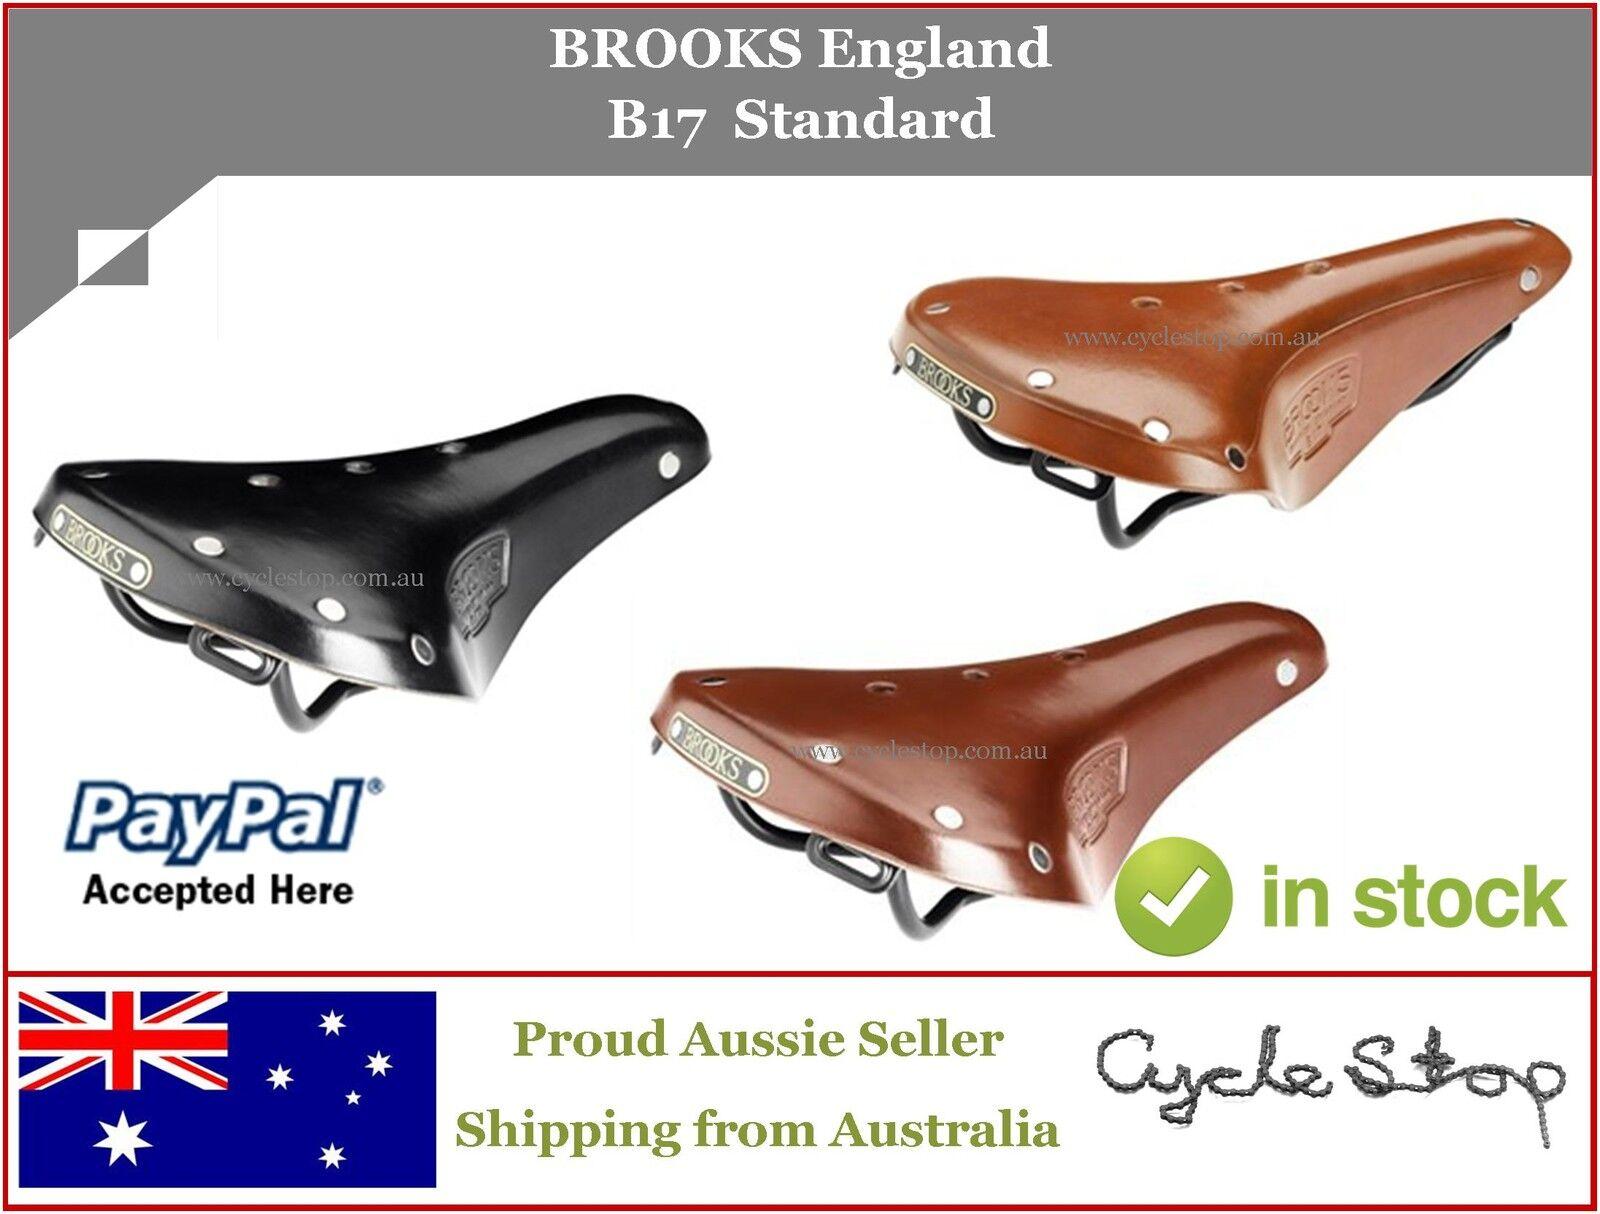 BIKE SEAT - BROOKS England - GENTS B17 LEATHER SADDLE + 40g Proofide tin